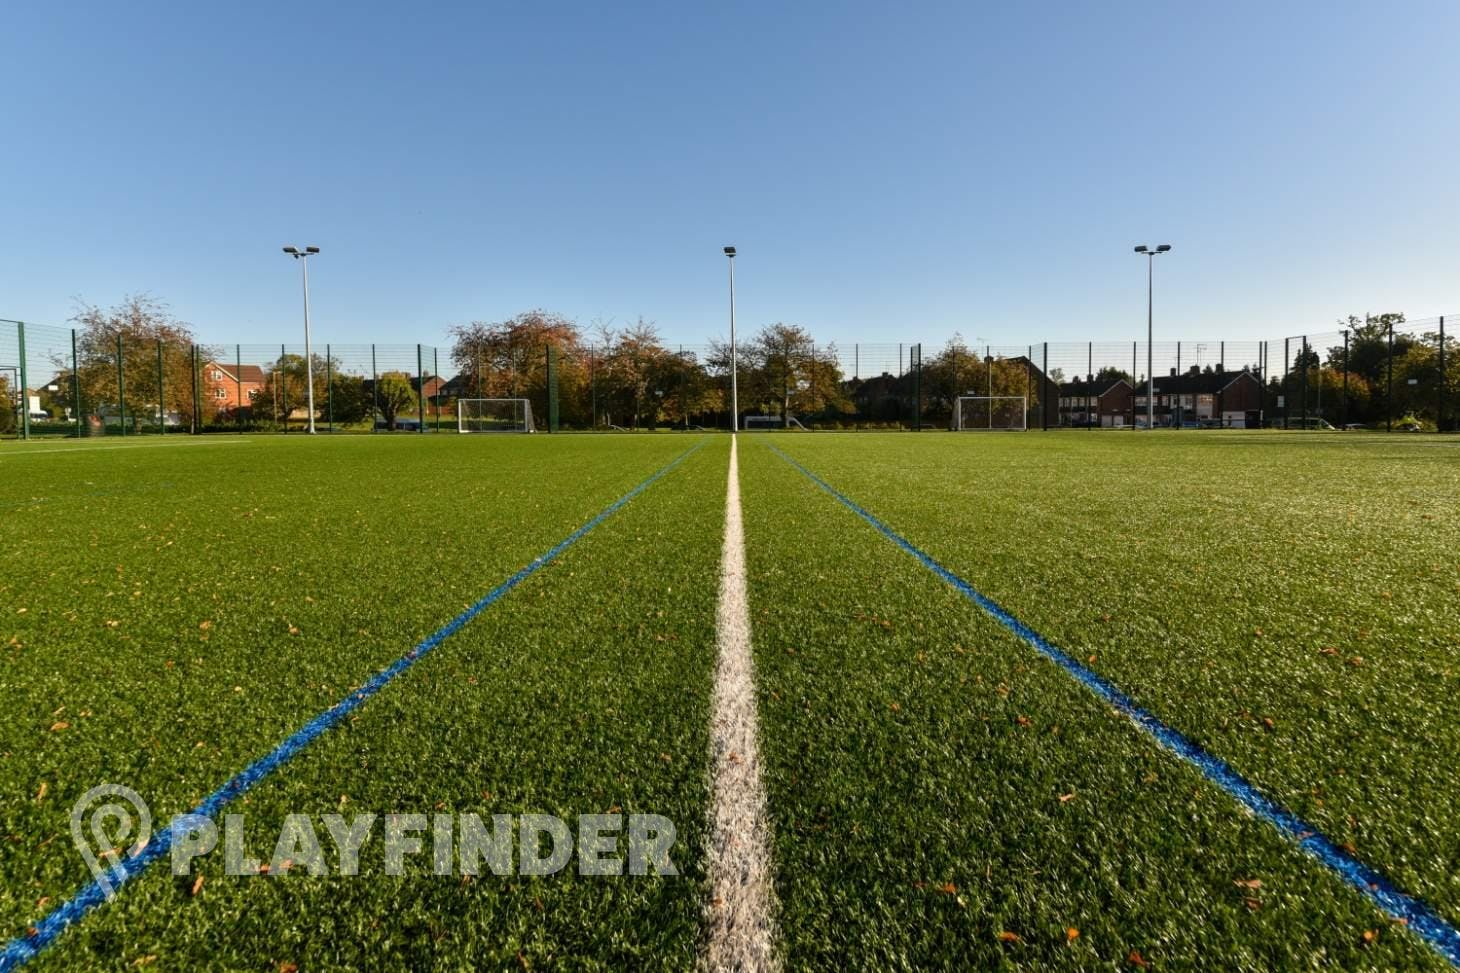 Meriden Community Centre 5 a side   3G Astroturf football pitch